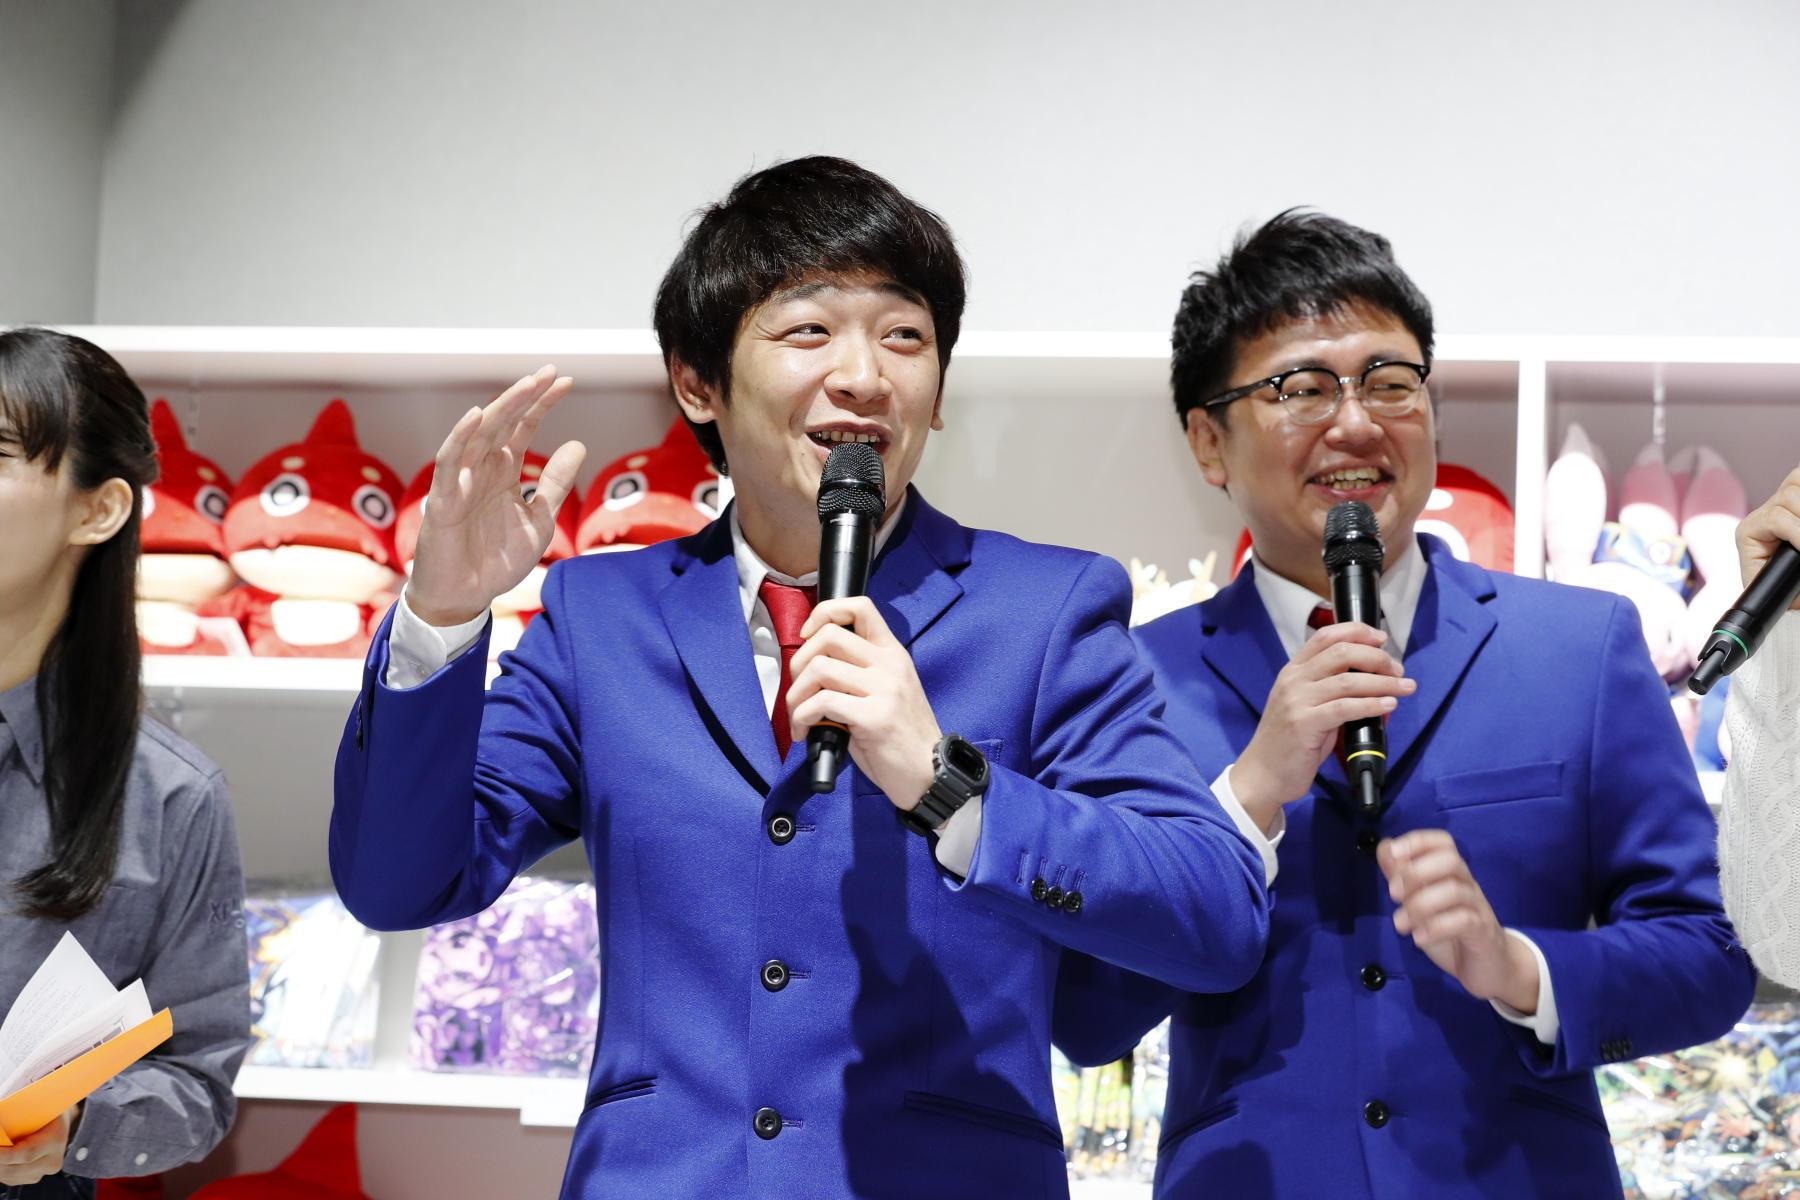 http://news.yoshimoto.co.jp/20190124202756-cf68878cf126dffcfc3a2a1a546906c086be7789.jpg